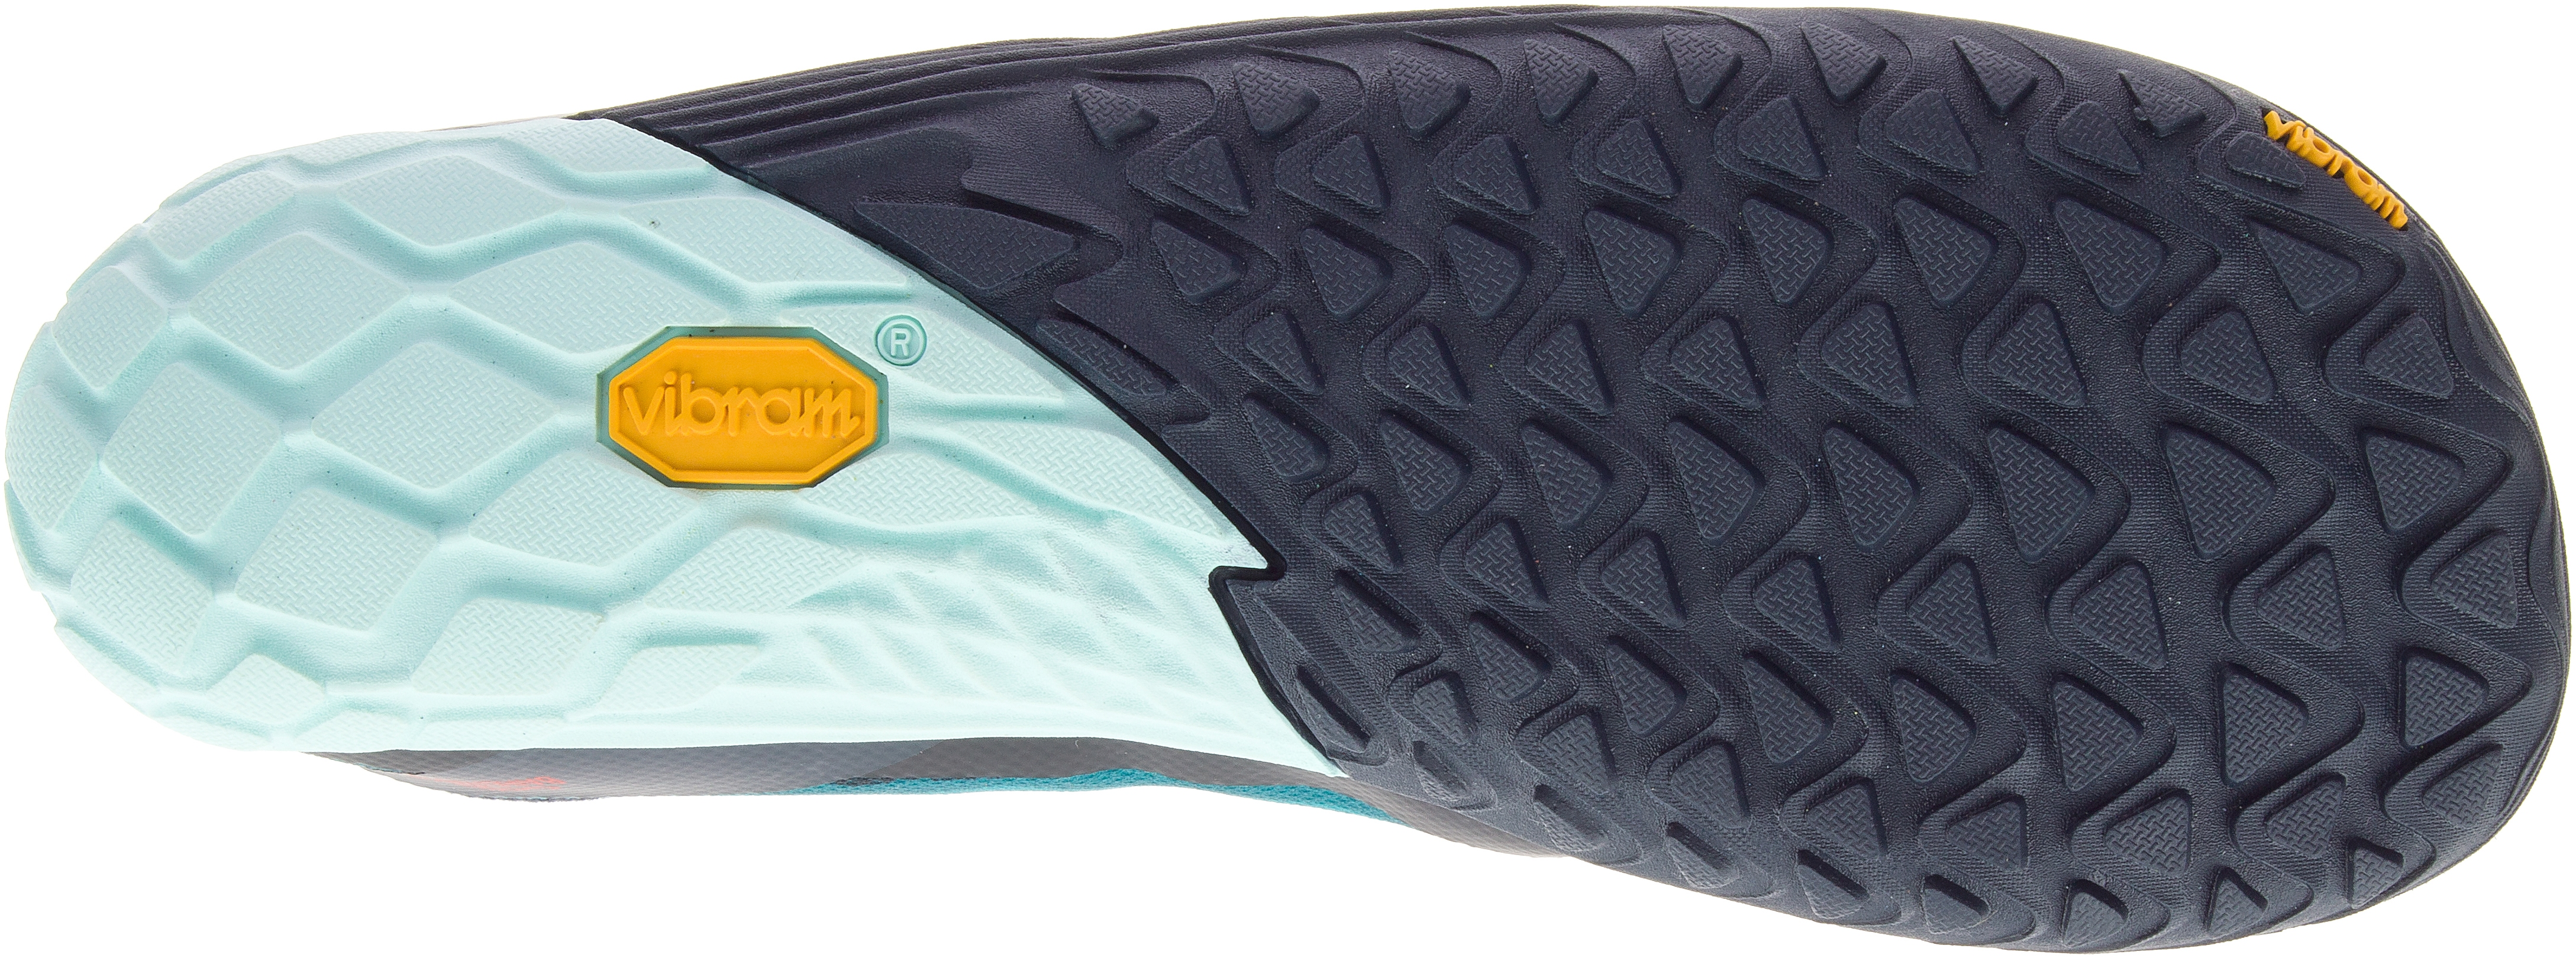 Vapor Glove 4, Bleached Aqua